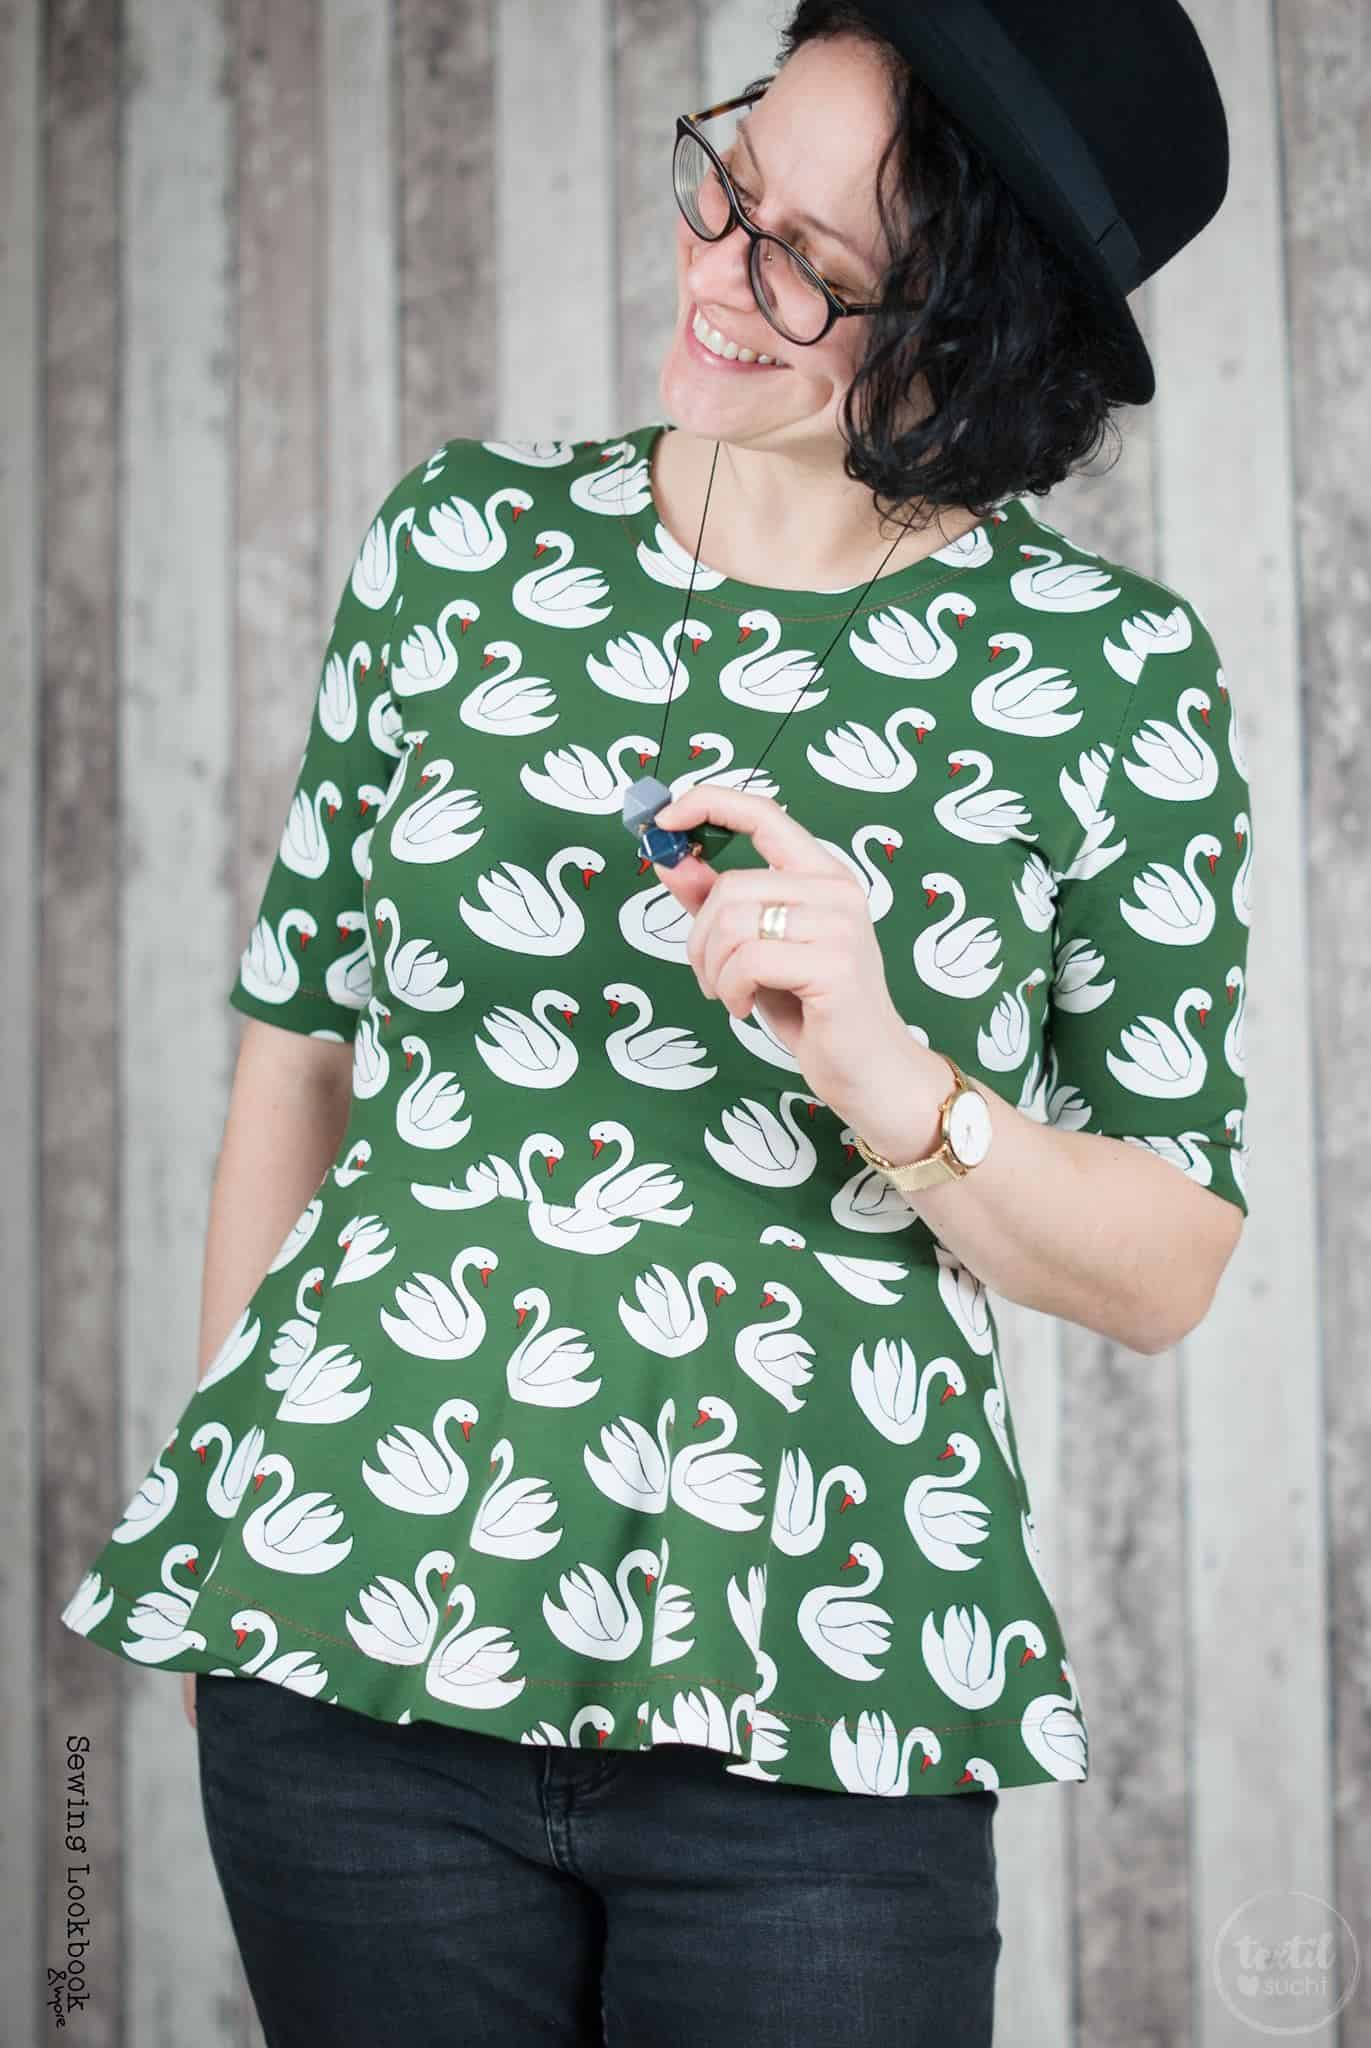 Schnittmuster Volant Shirt Nastja - inkl. Nähanleitung » Textilsucht®